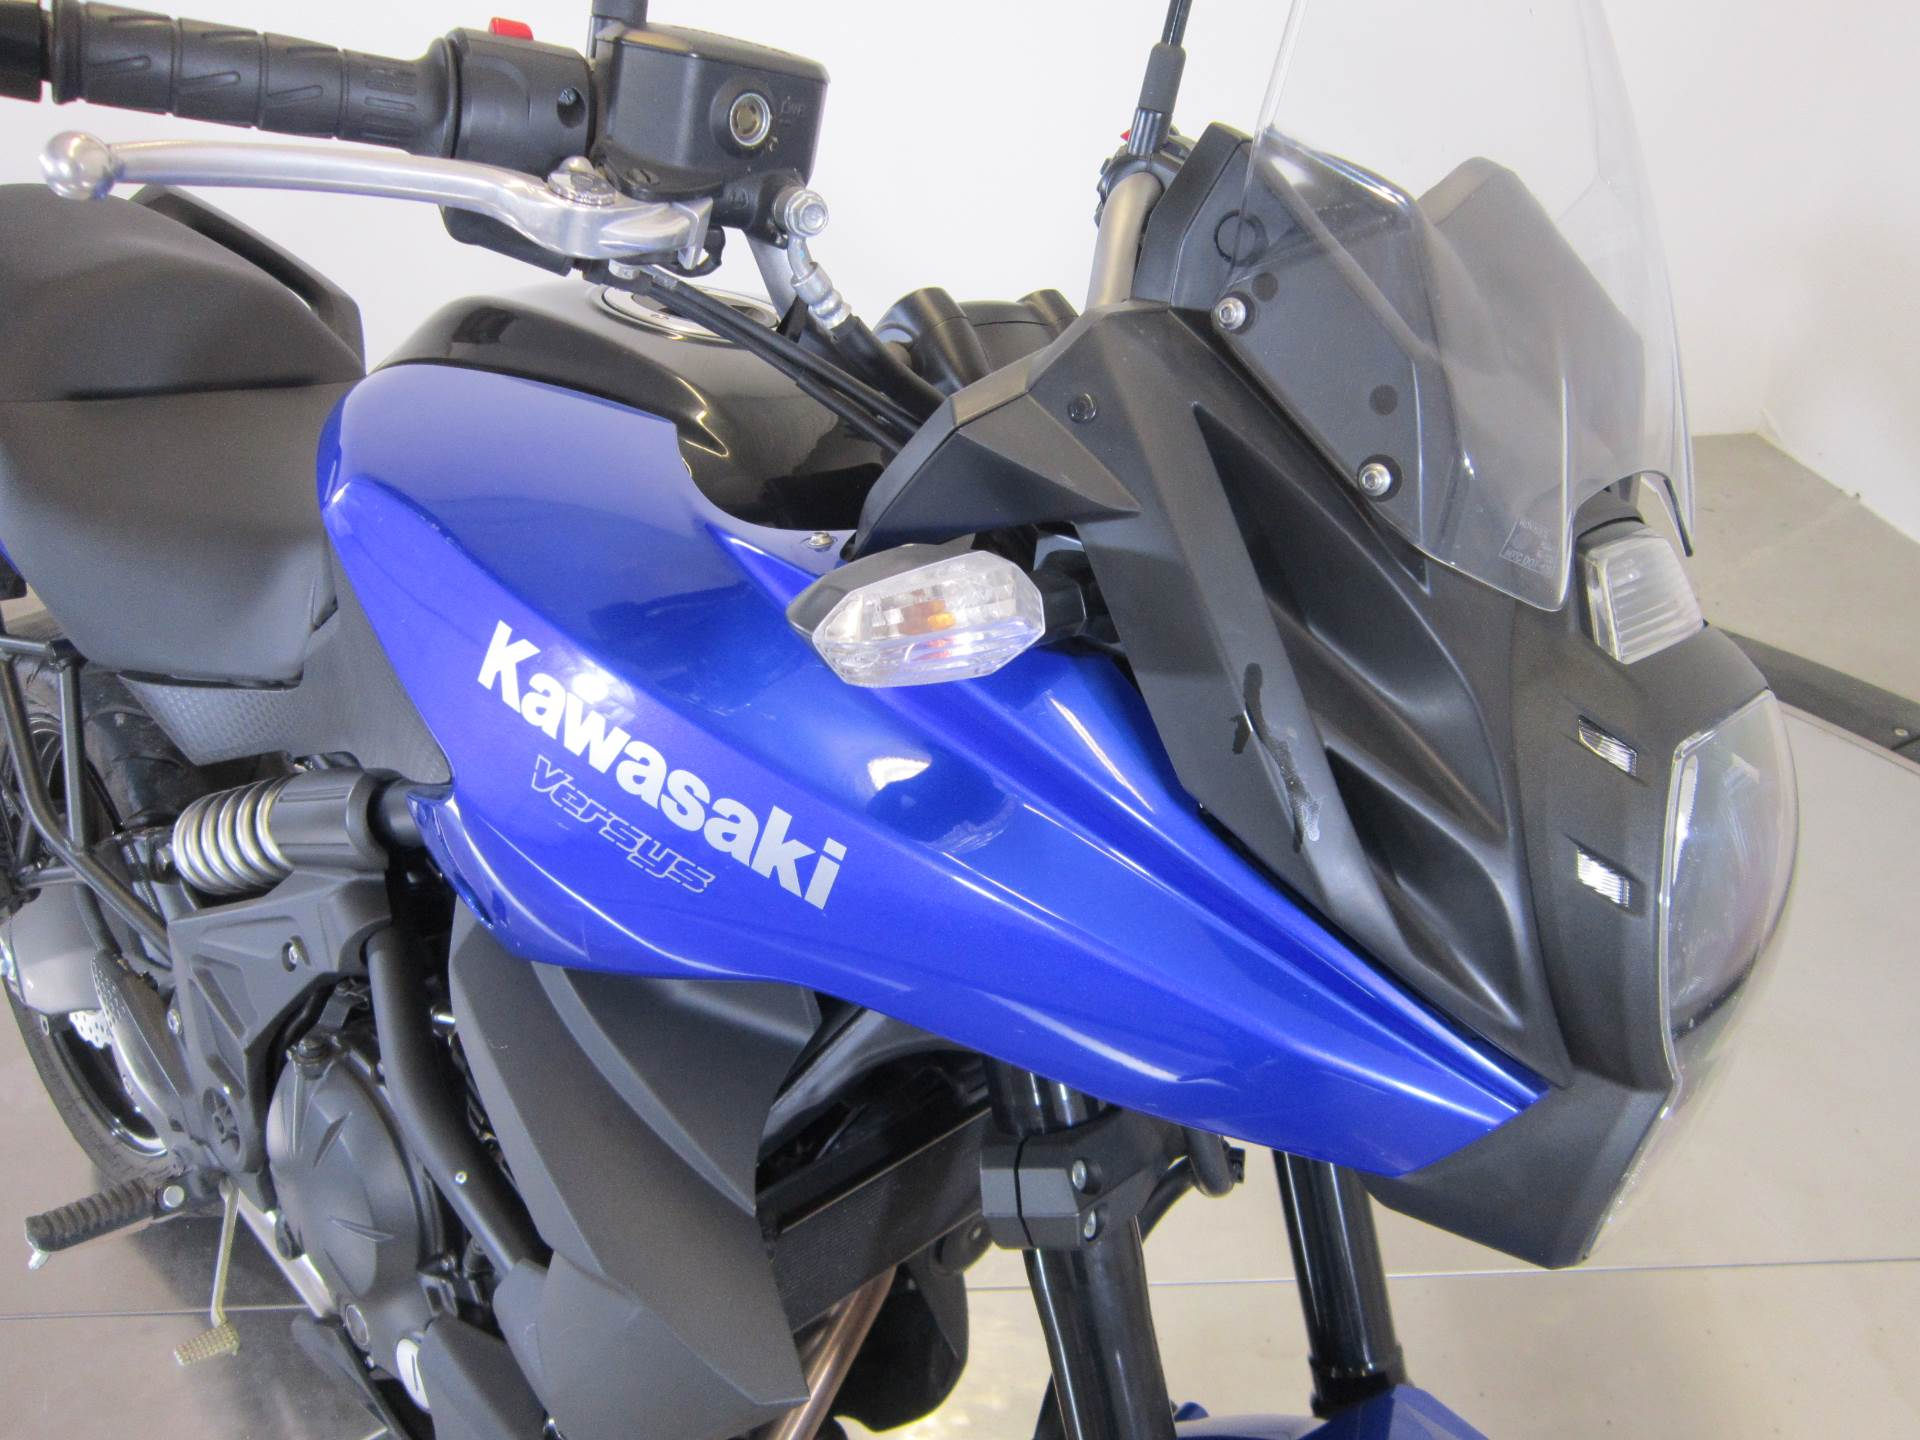 2013 Kawasaki Versys® in Greenwood Village, Colorado